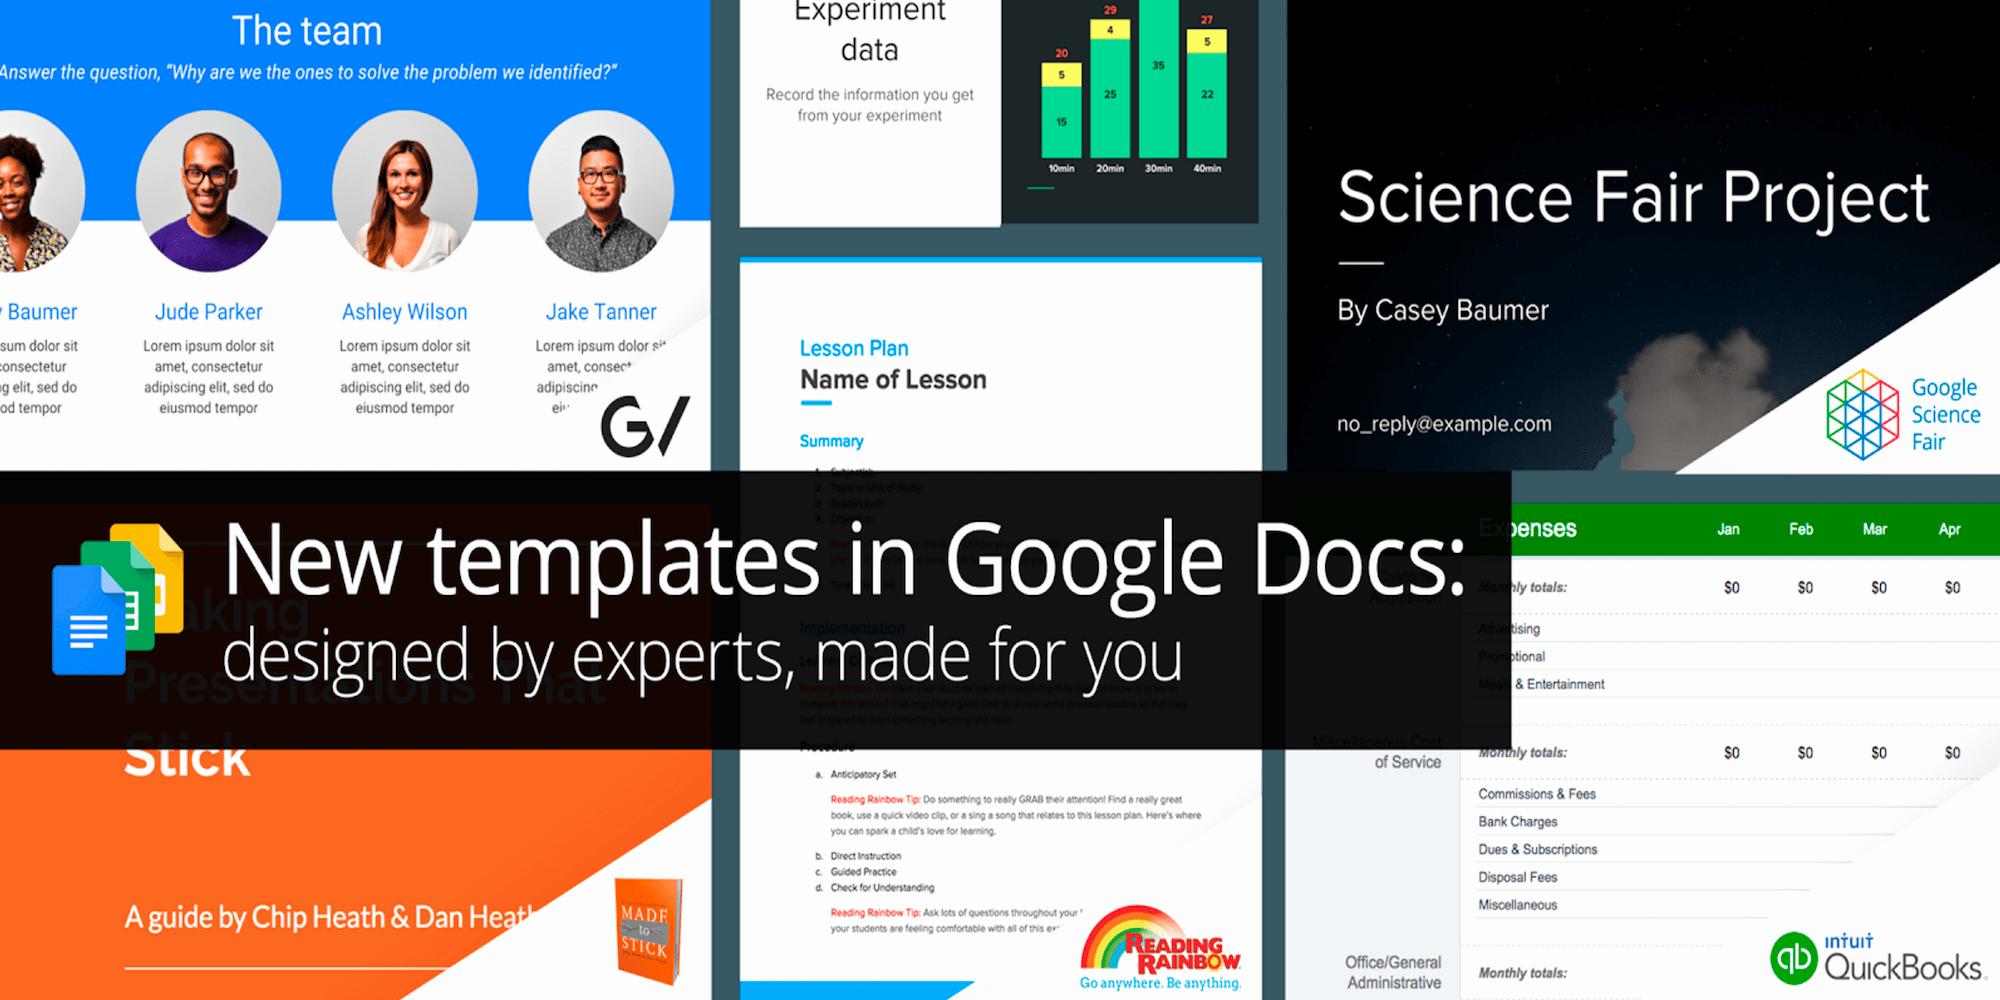 3 by 5 Notecard Template Google Docs Elegant Google Docs Sheets & Slides New Templates On Web